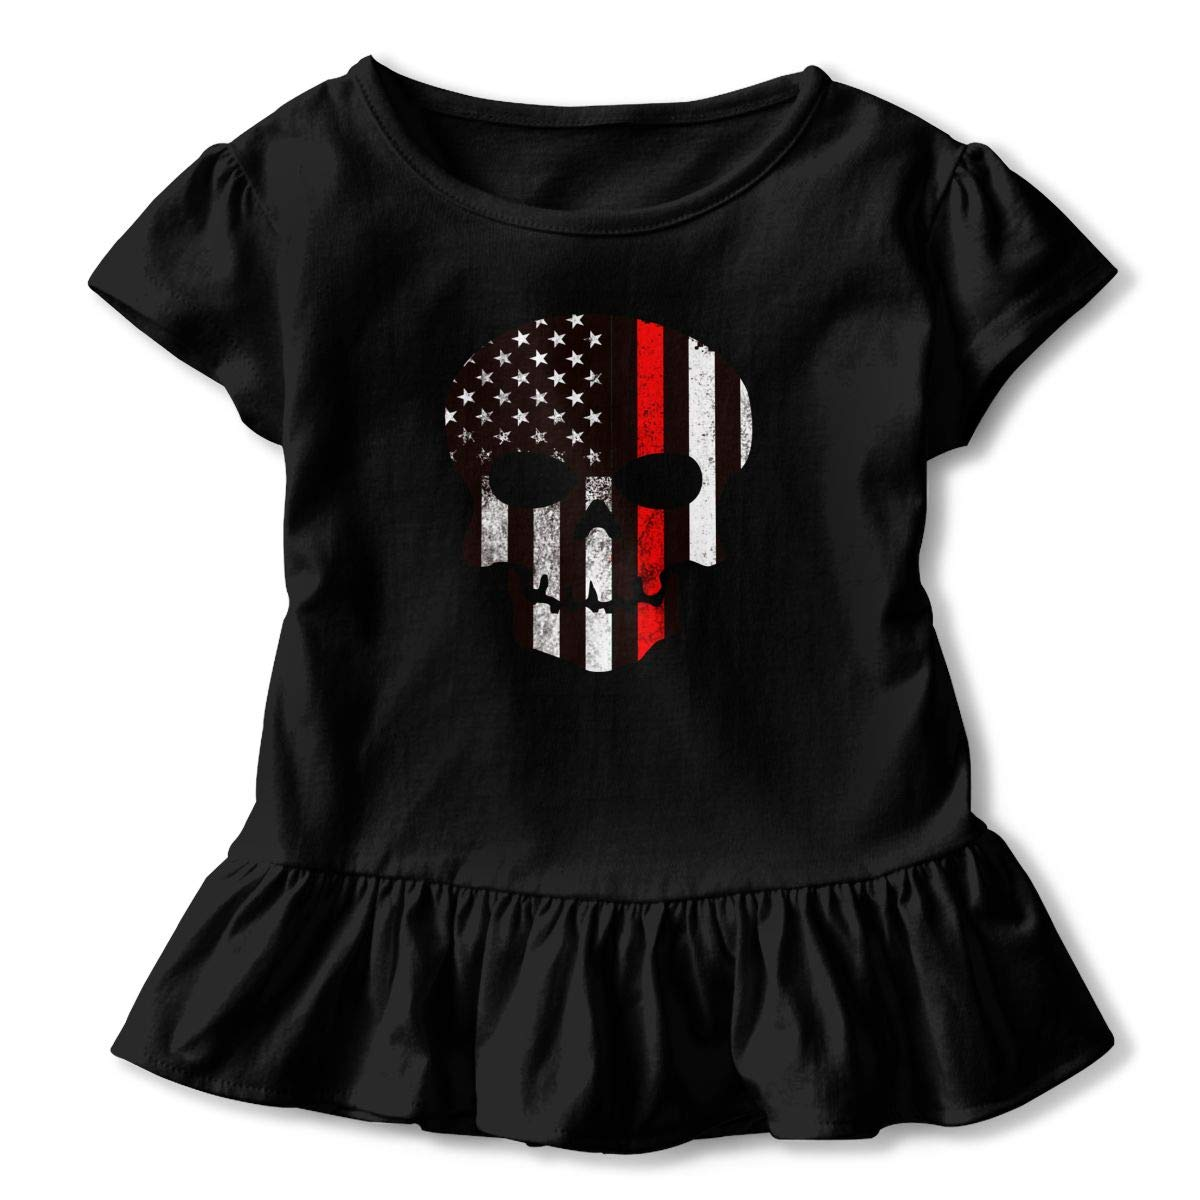 Thin Red Line Skull USA Flag Firefighter Baby Girls Summer Dress Outfits Ruffle Short T-Shirt Romper Dress,One-Piece Jumpsuit